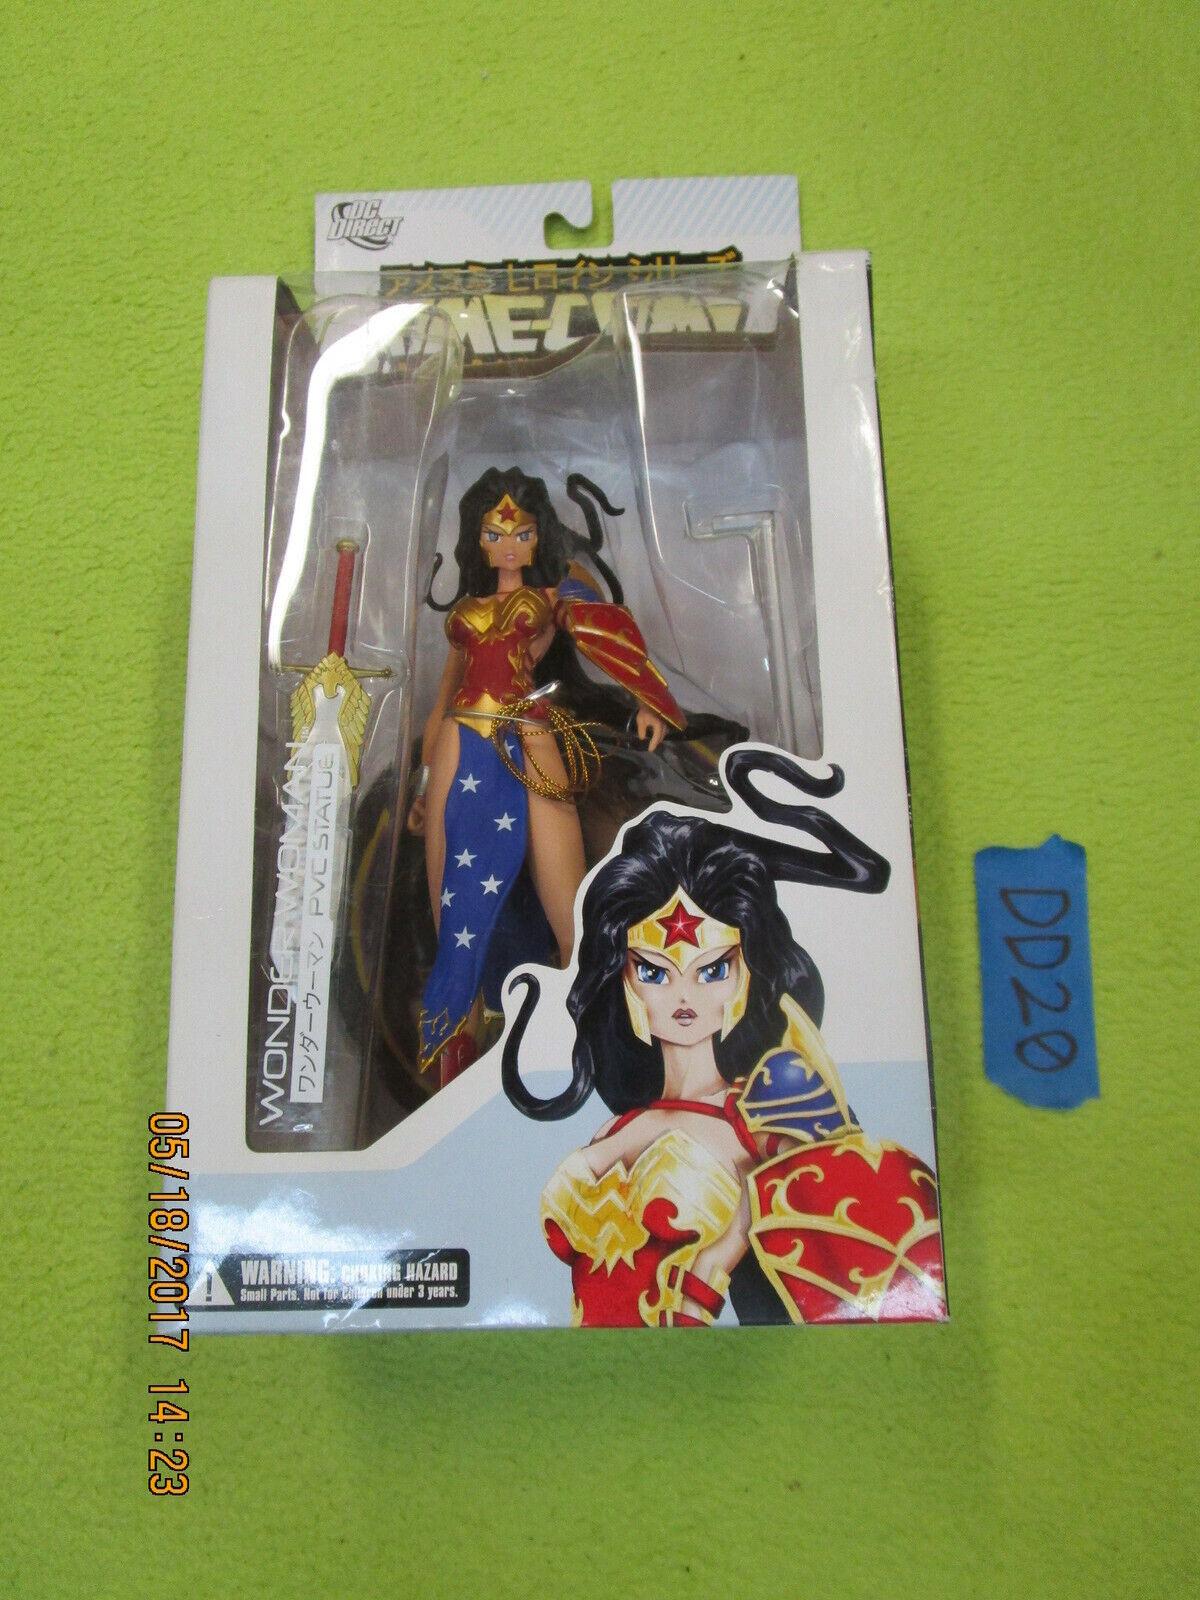 DD20 DC Direct Lot AME COMI WONDER WOMAN V.1 Heroine Anime Girl Style PVC Figure